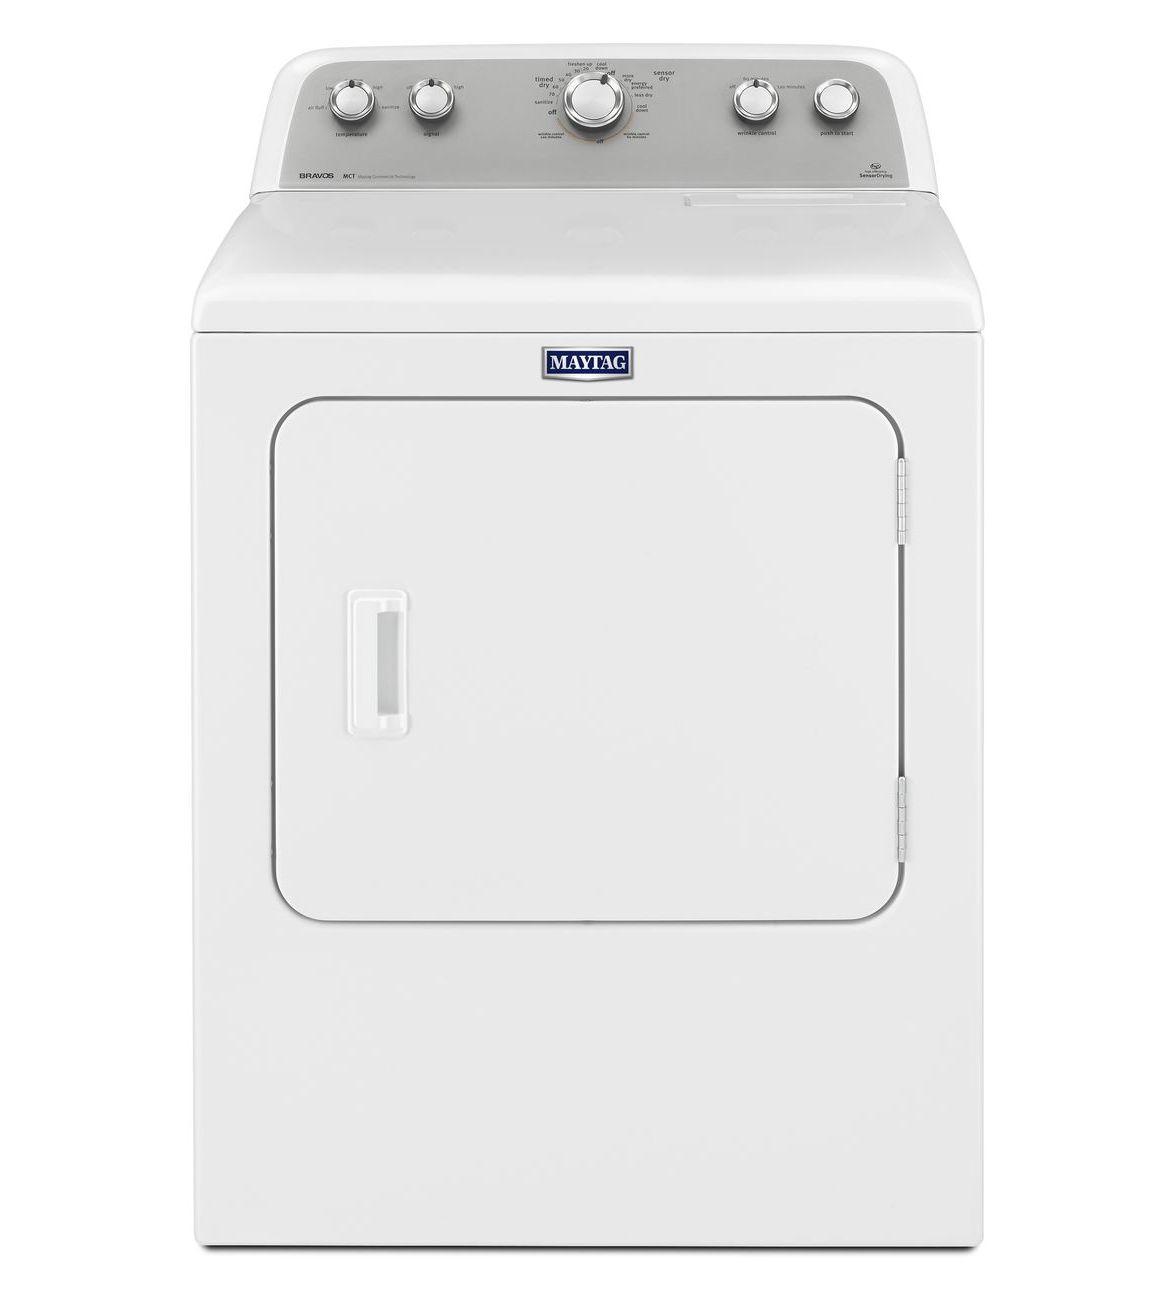 Maytag Dryer Medx655dw